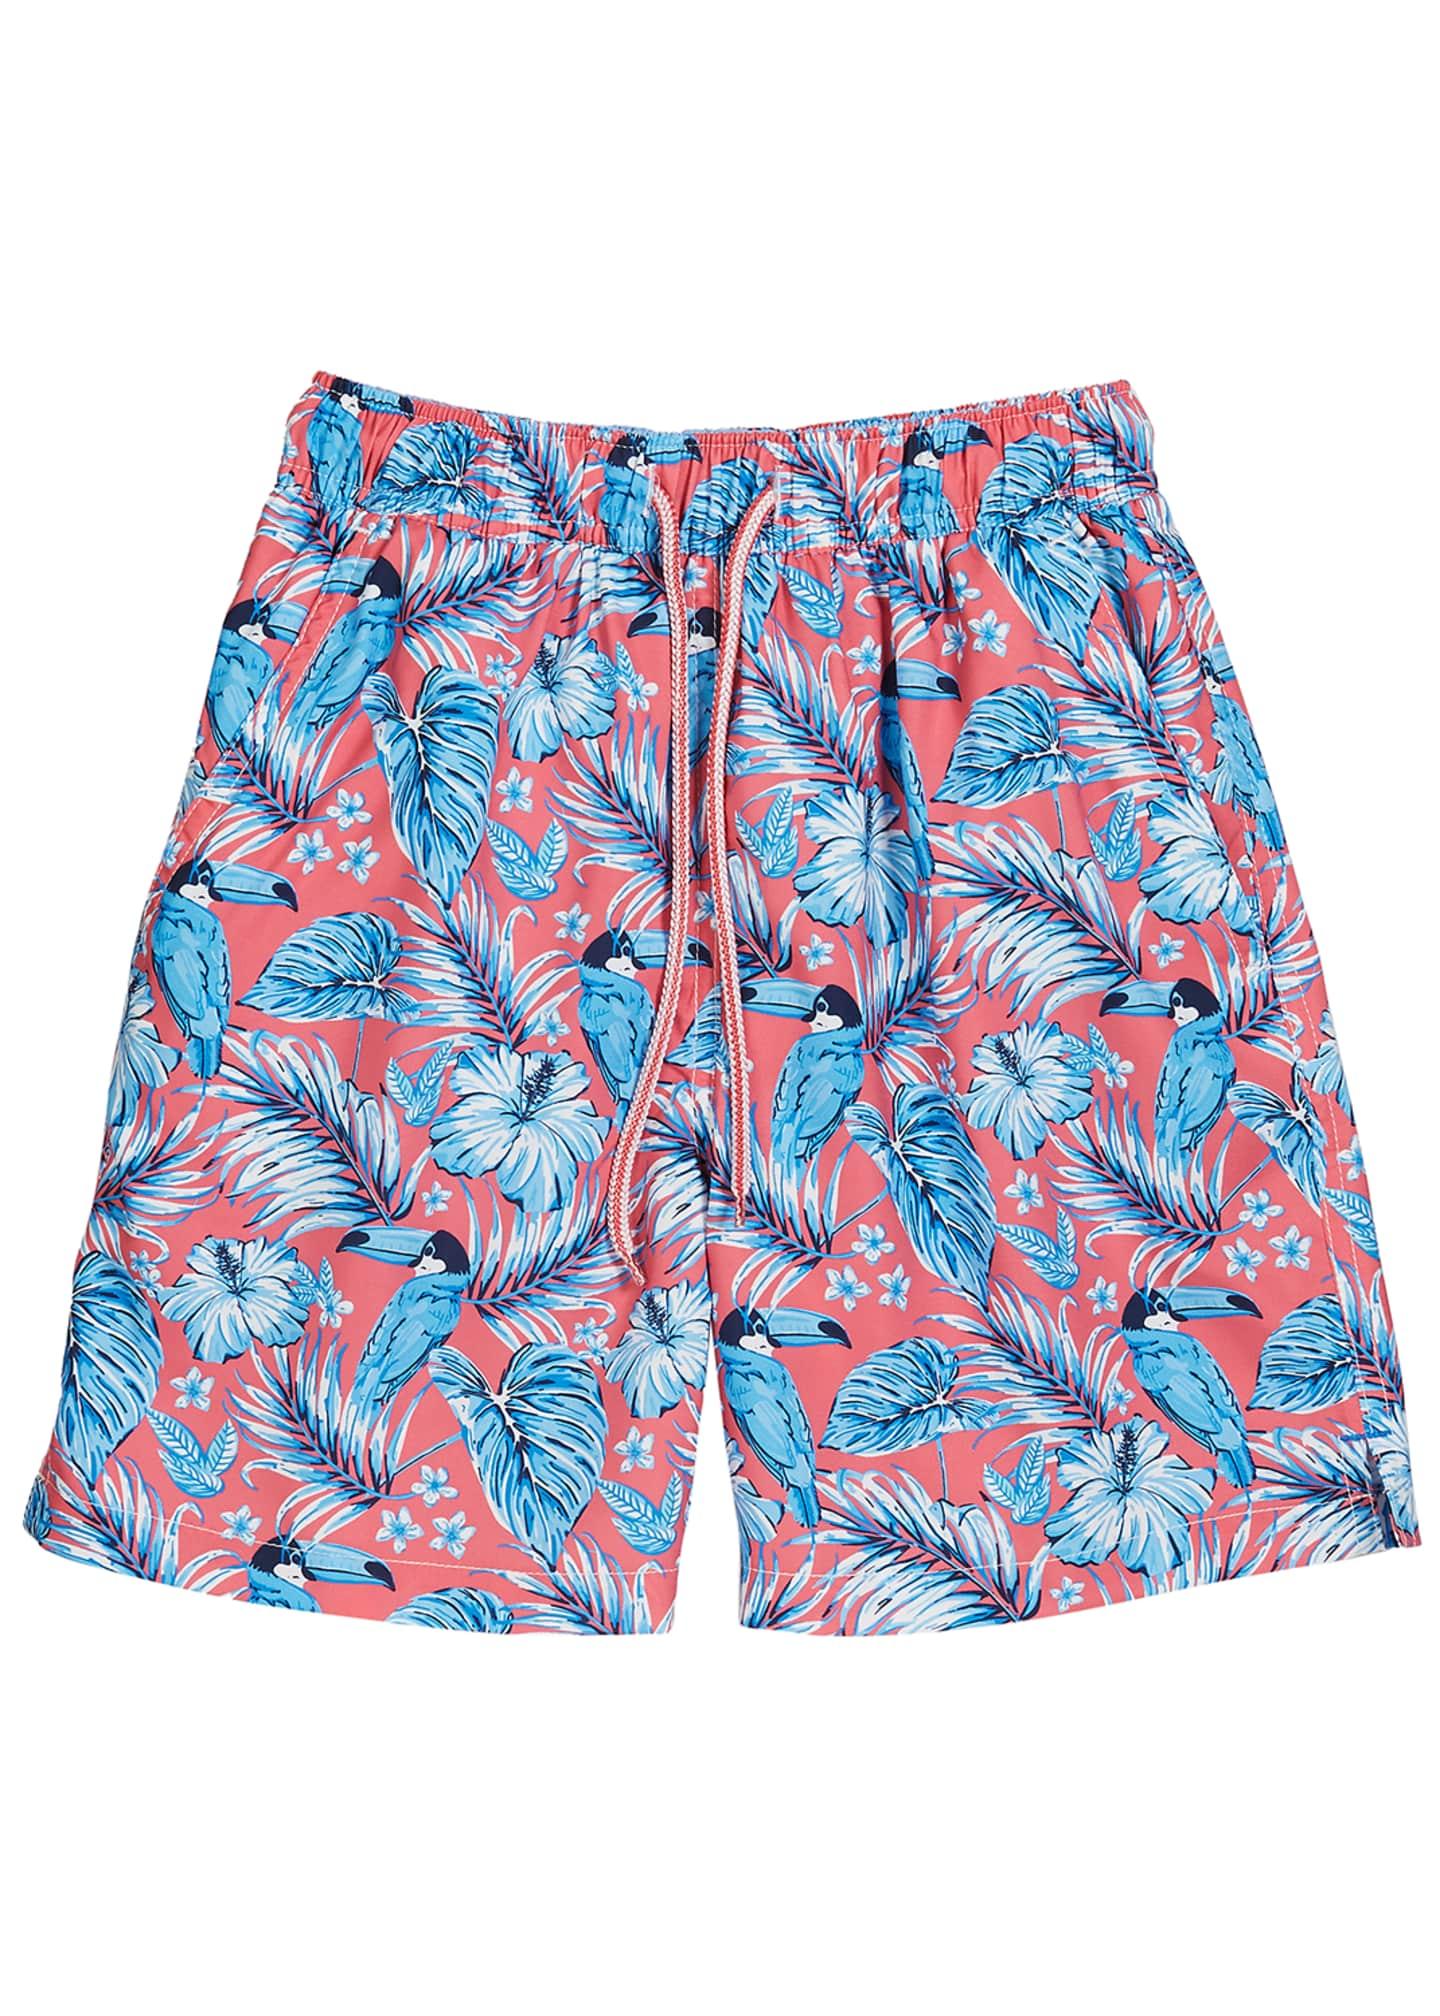 Peter Millar Boy's Tucanopy Tropical Print Swim Trunks,